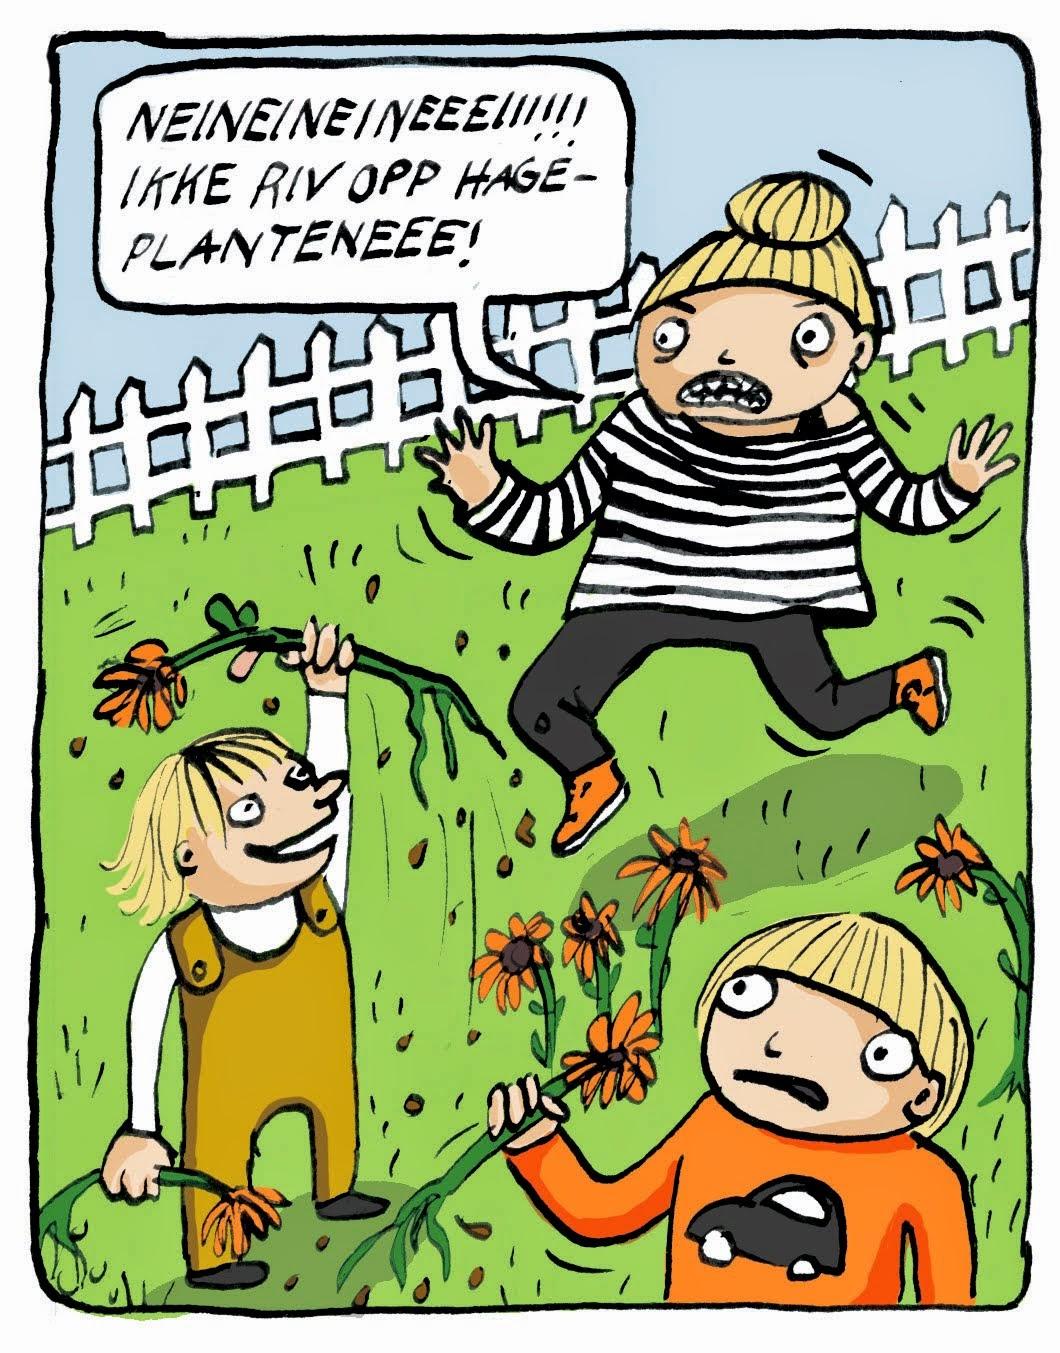 min tegneserieblogg: